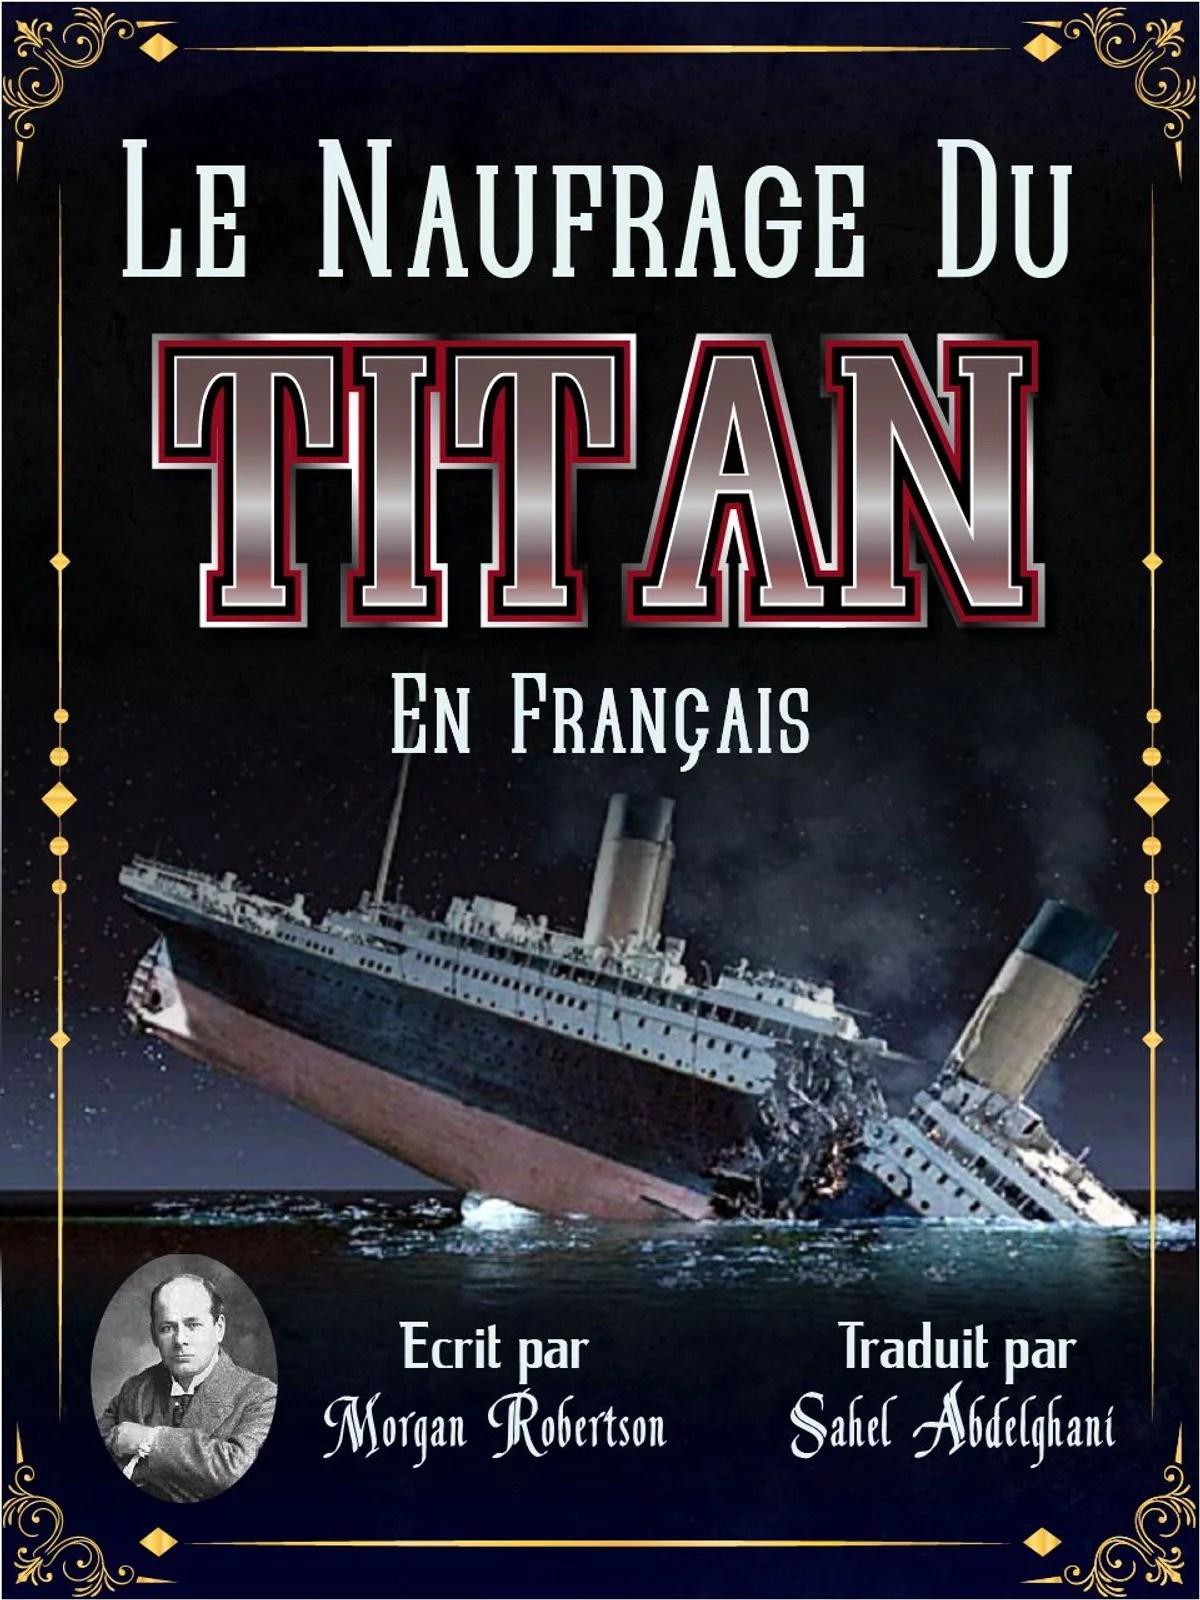 Le Naufrage du « Titan » — Wikipédia